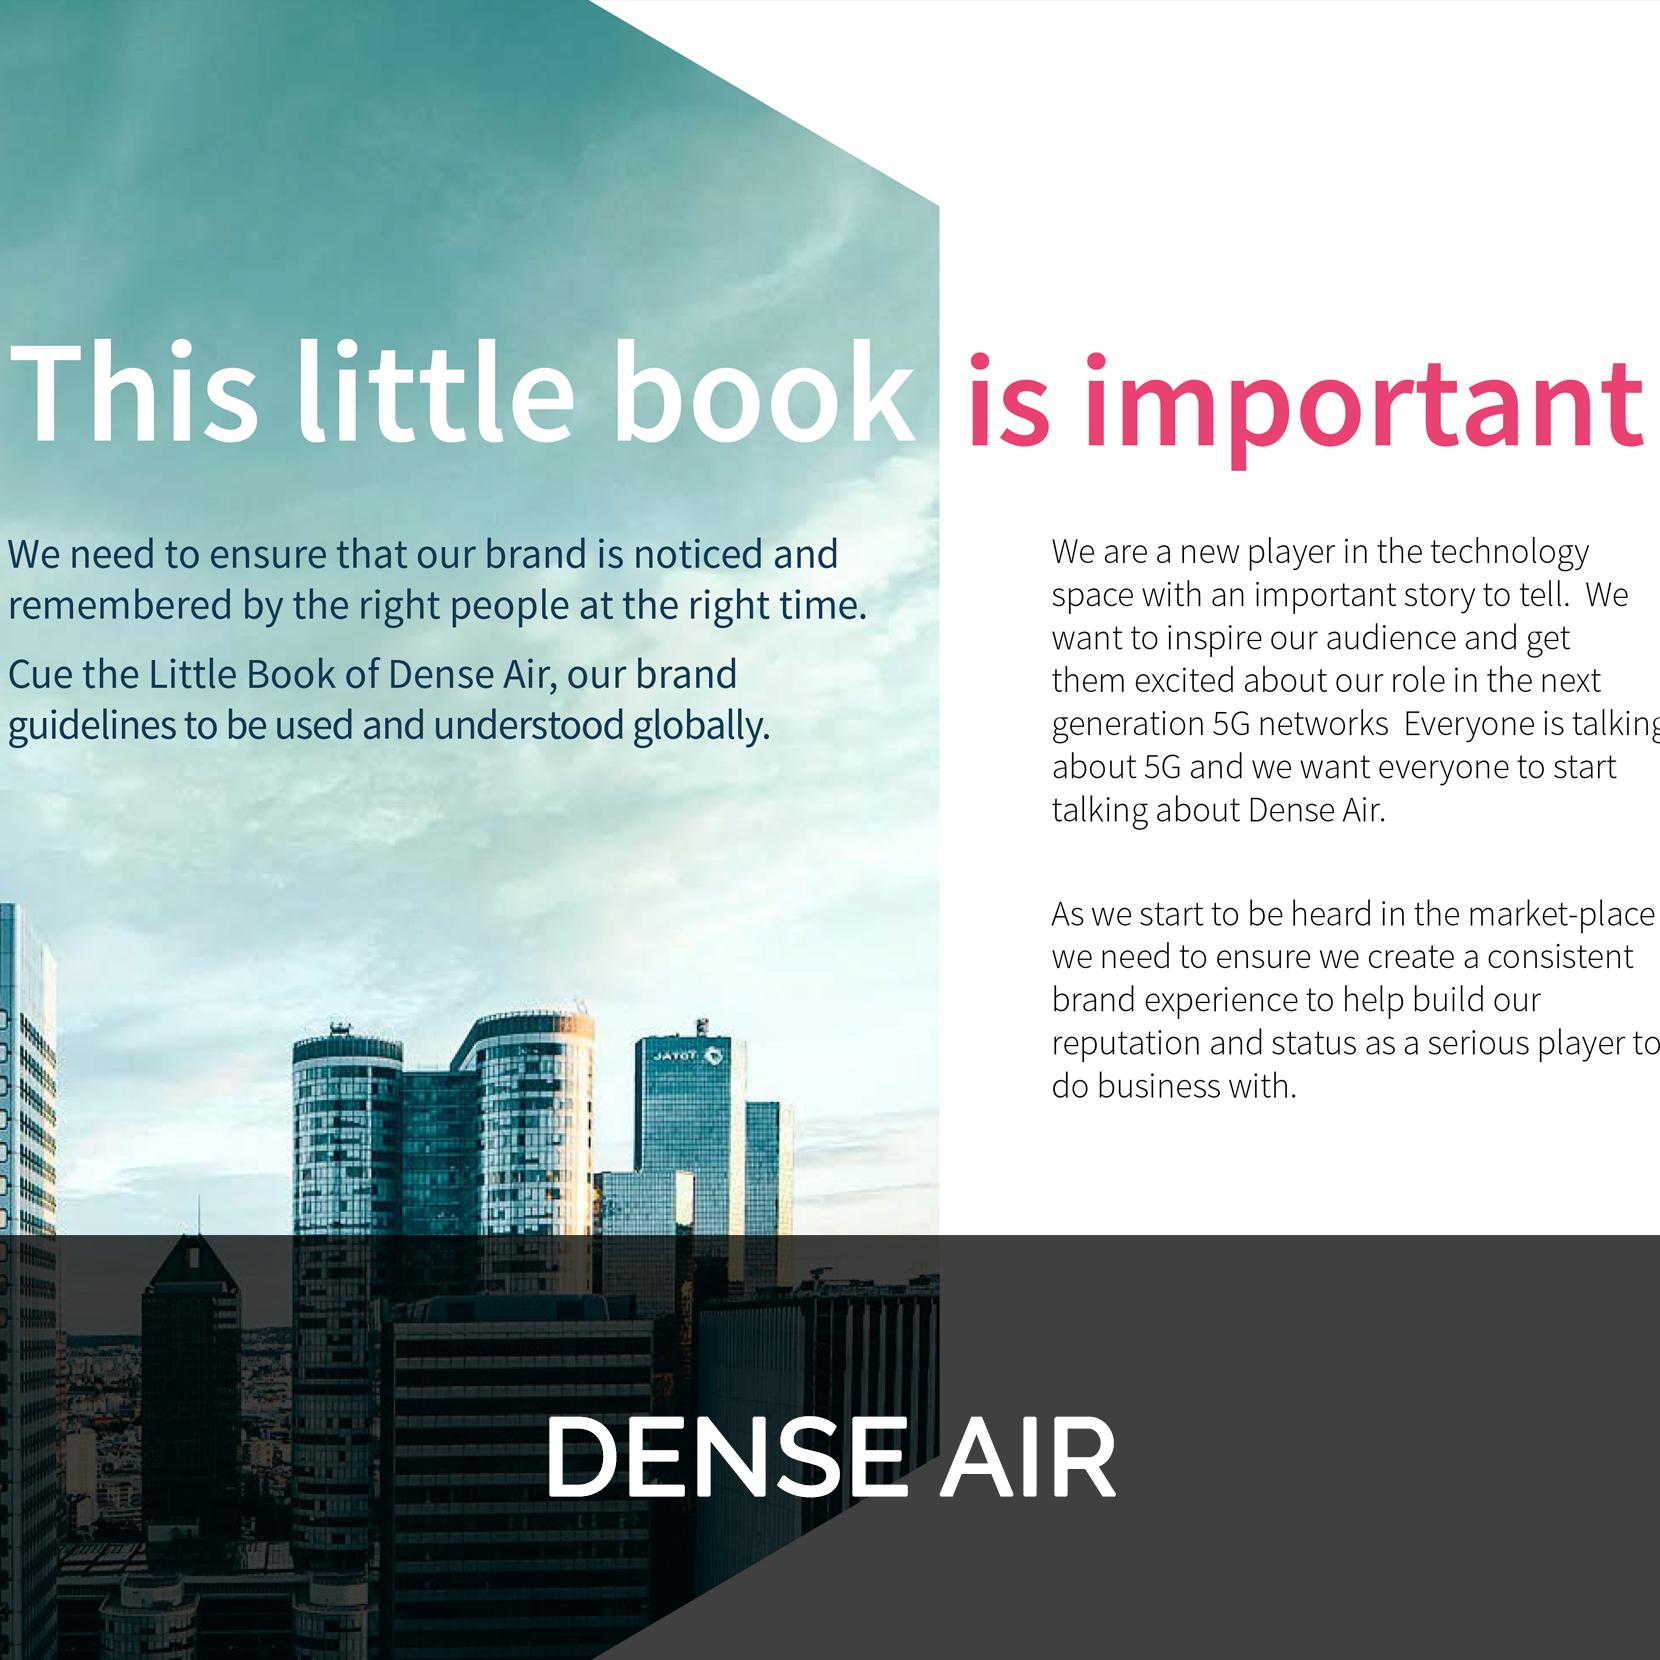 http://rusyndesign.co.uk/wp-content/uploads/2015/04/Work-square-Dense-Air.jpg